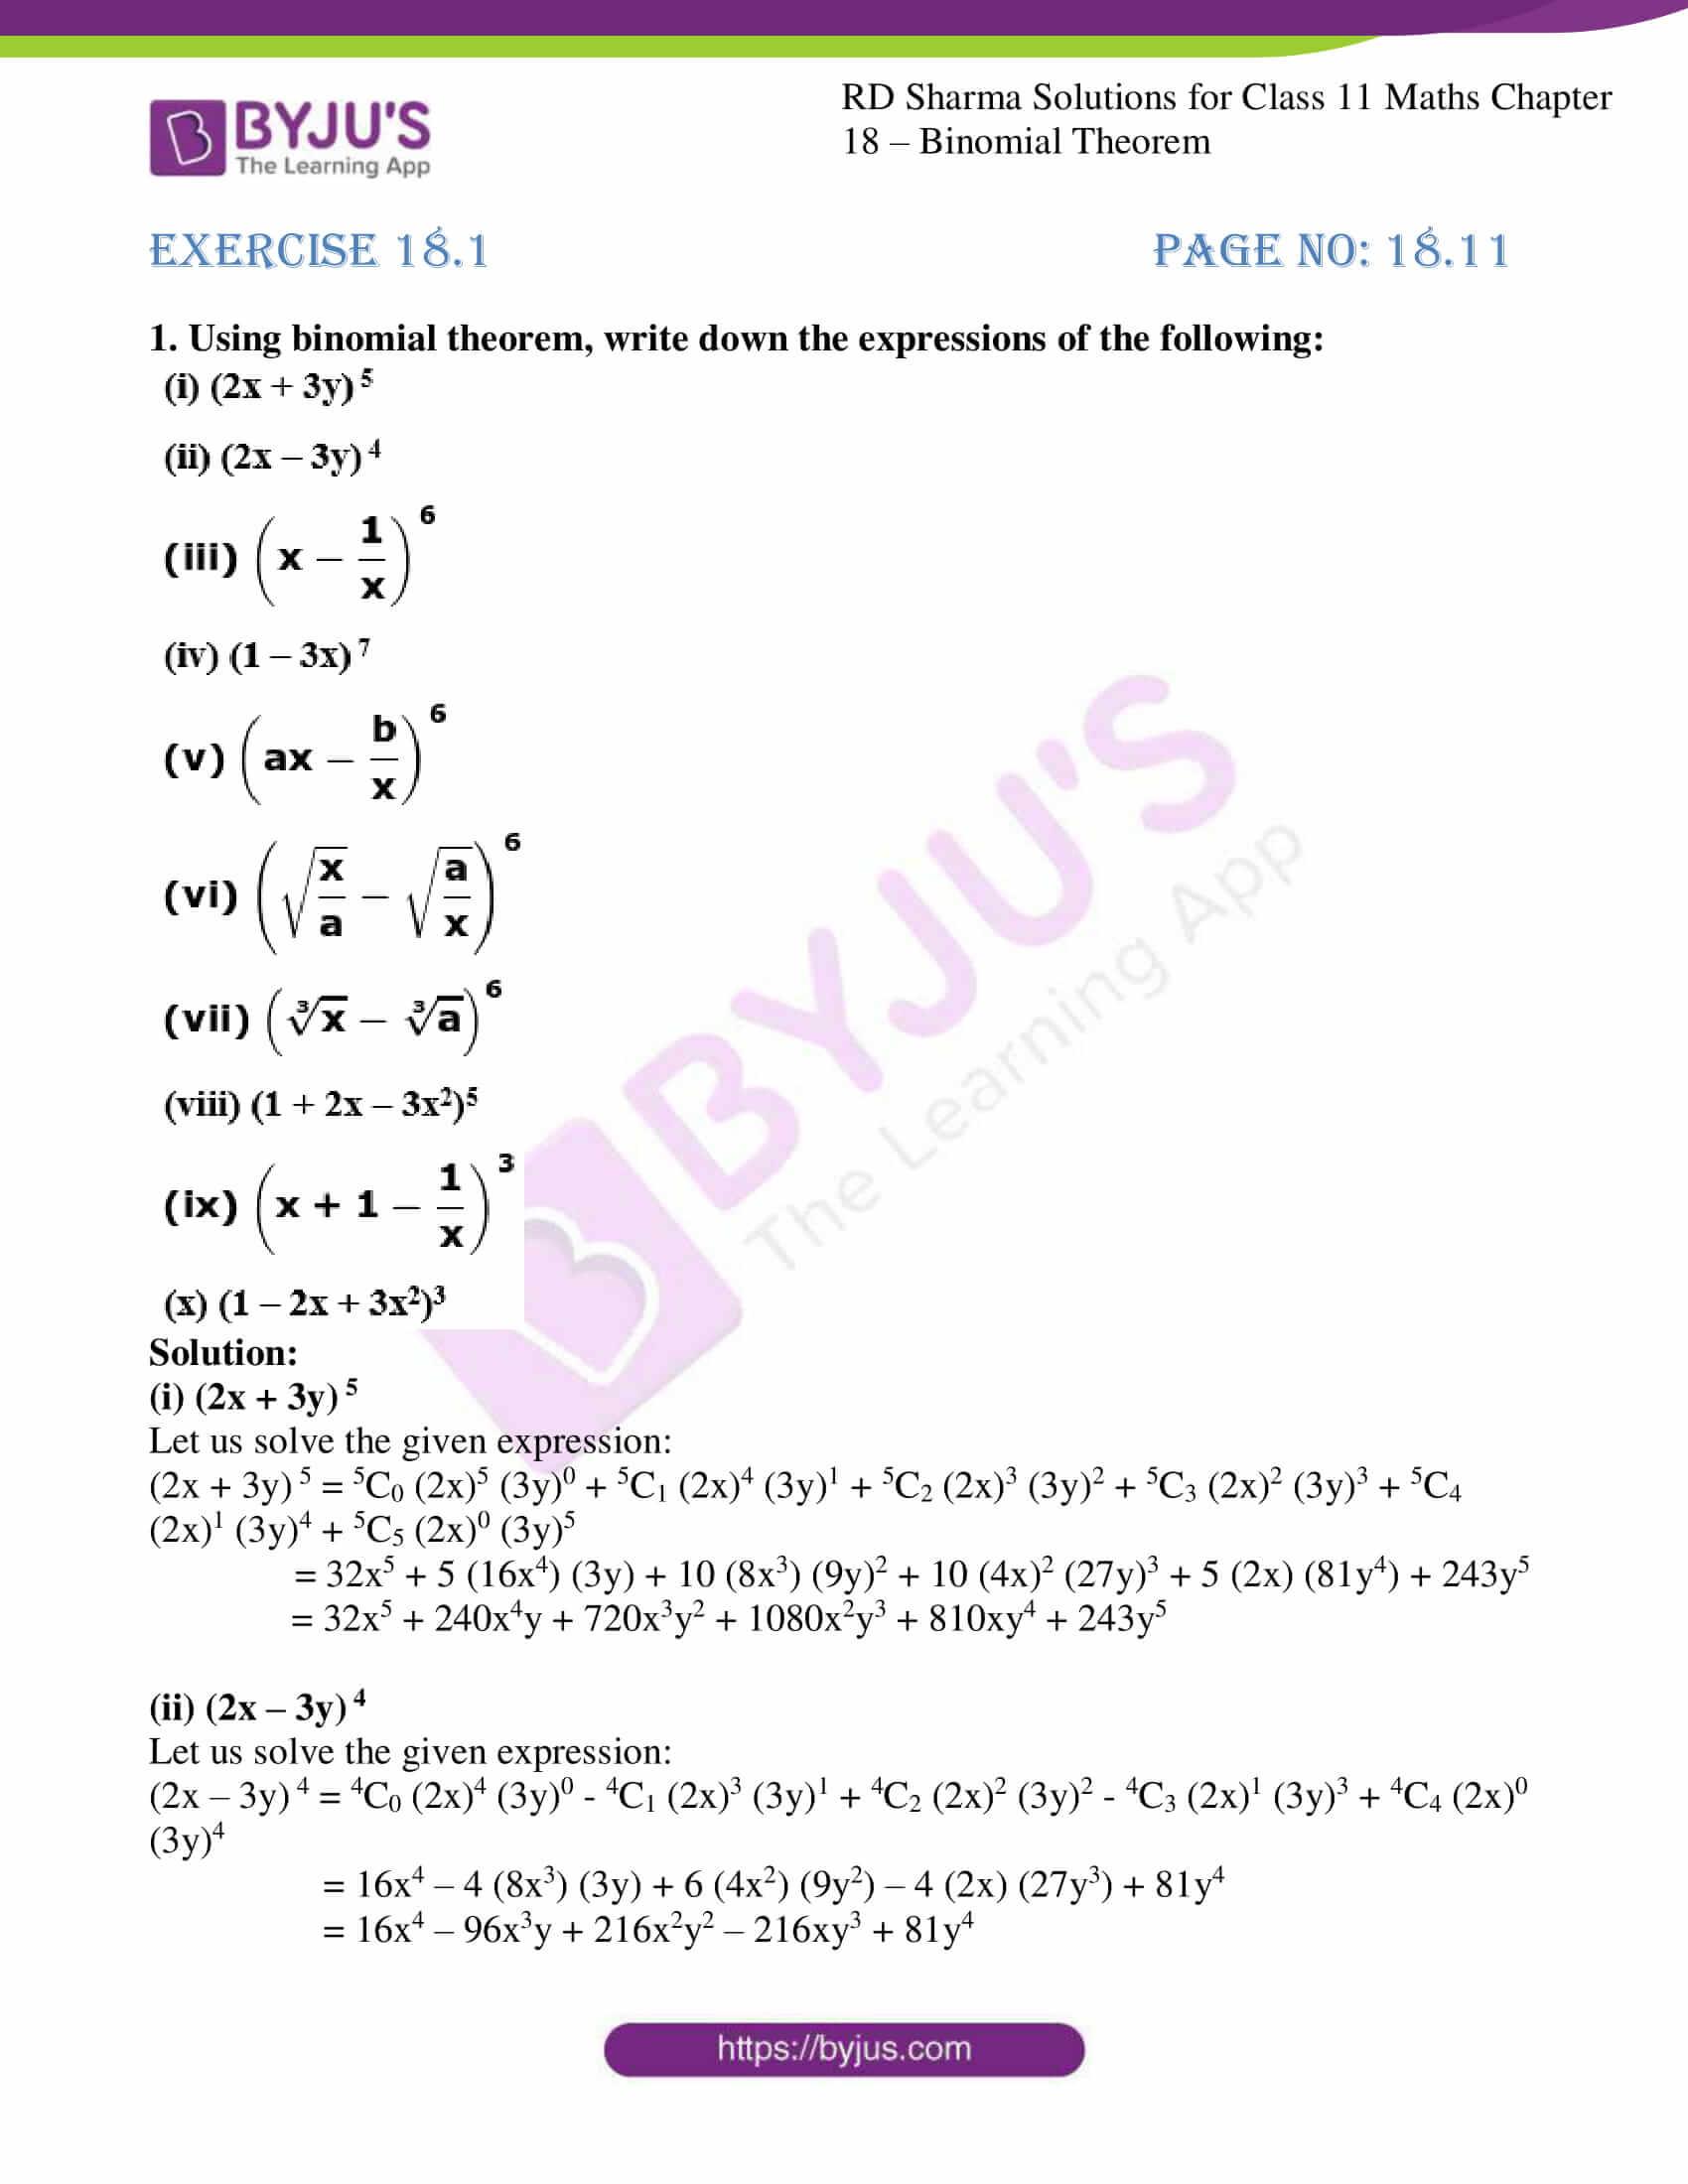 rd sharma class 11 maths ch 18 ex 1 01